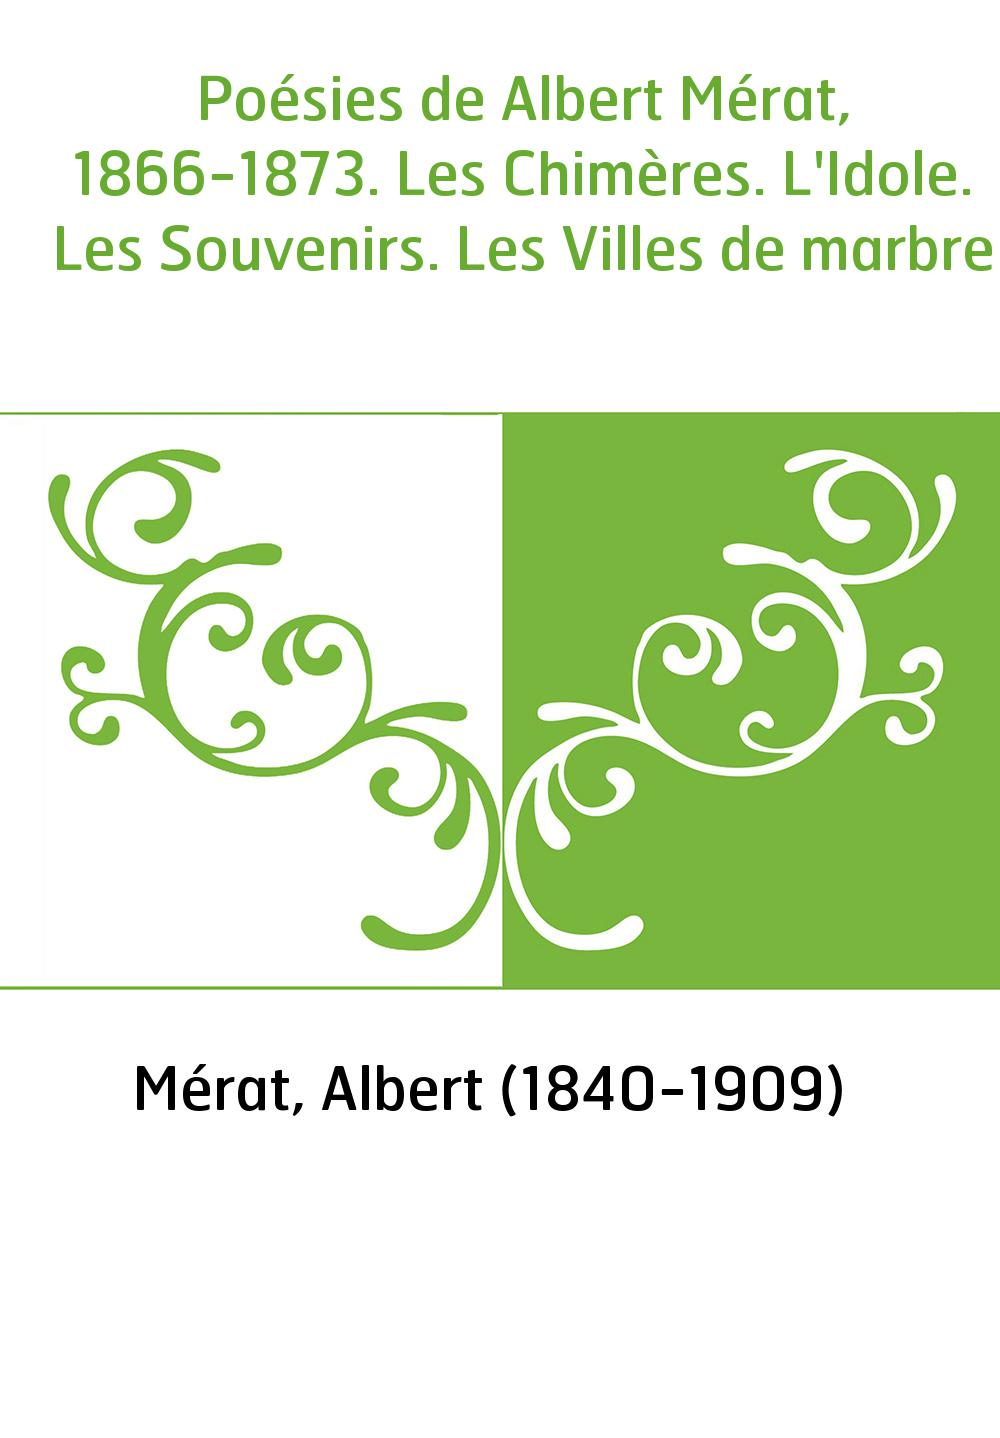 Poésies de Albert Mérat, 1866-1873. Les Chimères. L'Idole. Les Souvenirs. Les Villes de marbre